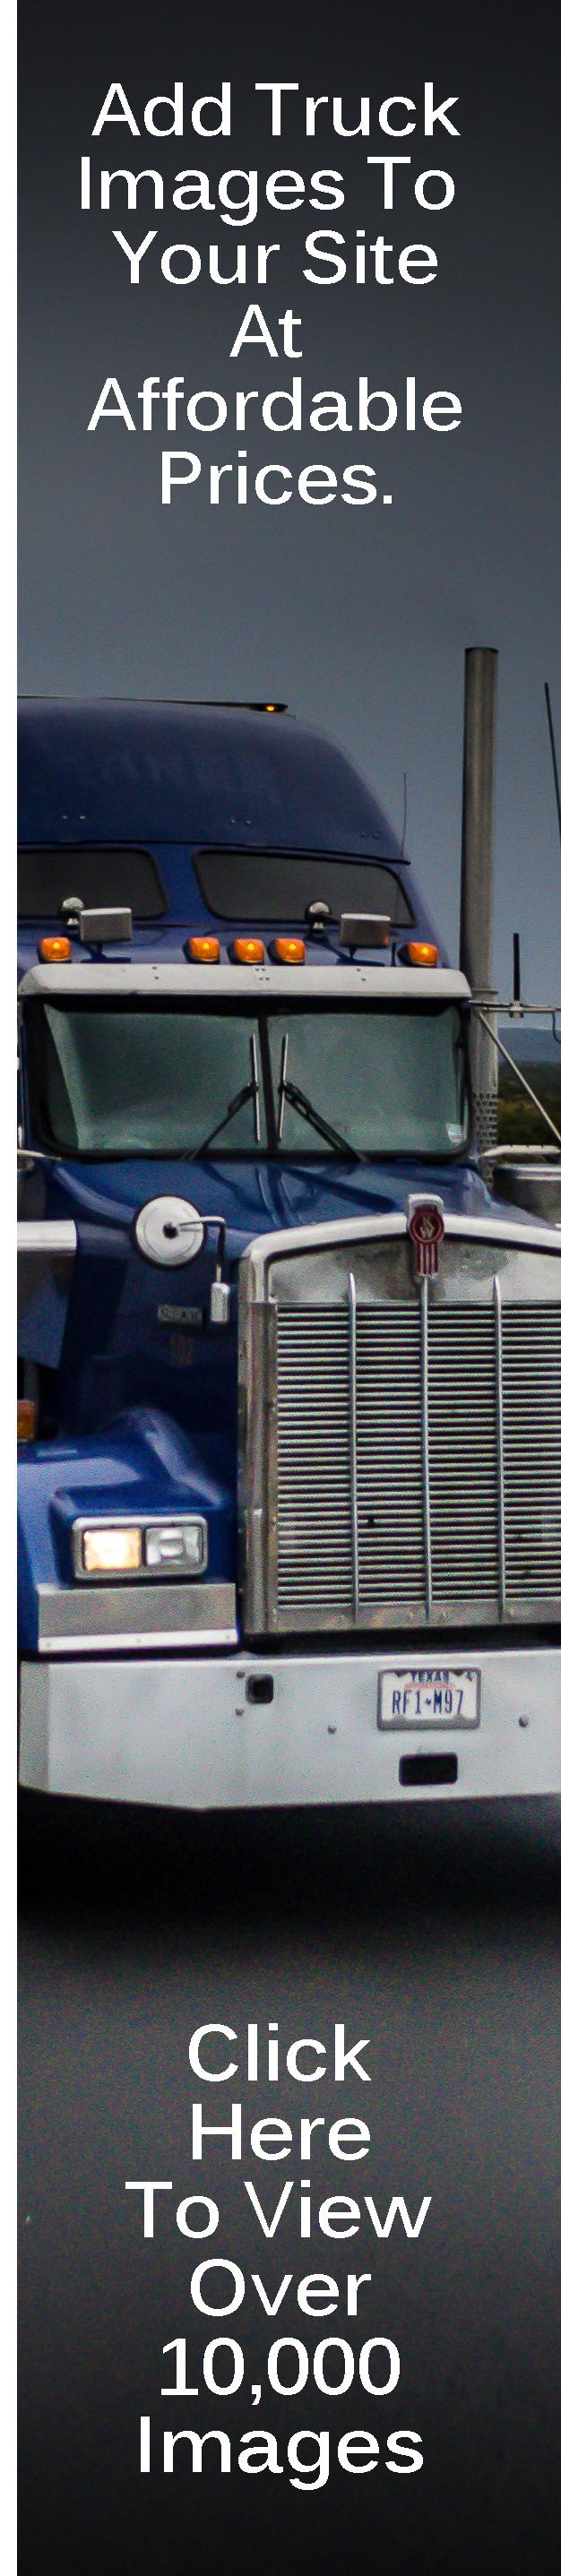 Truck_Right_Side_Banner_2_Run.jpg